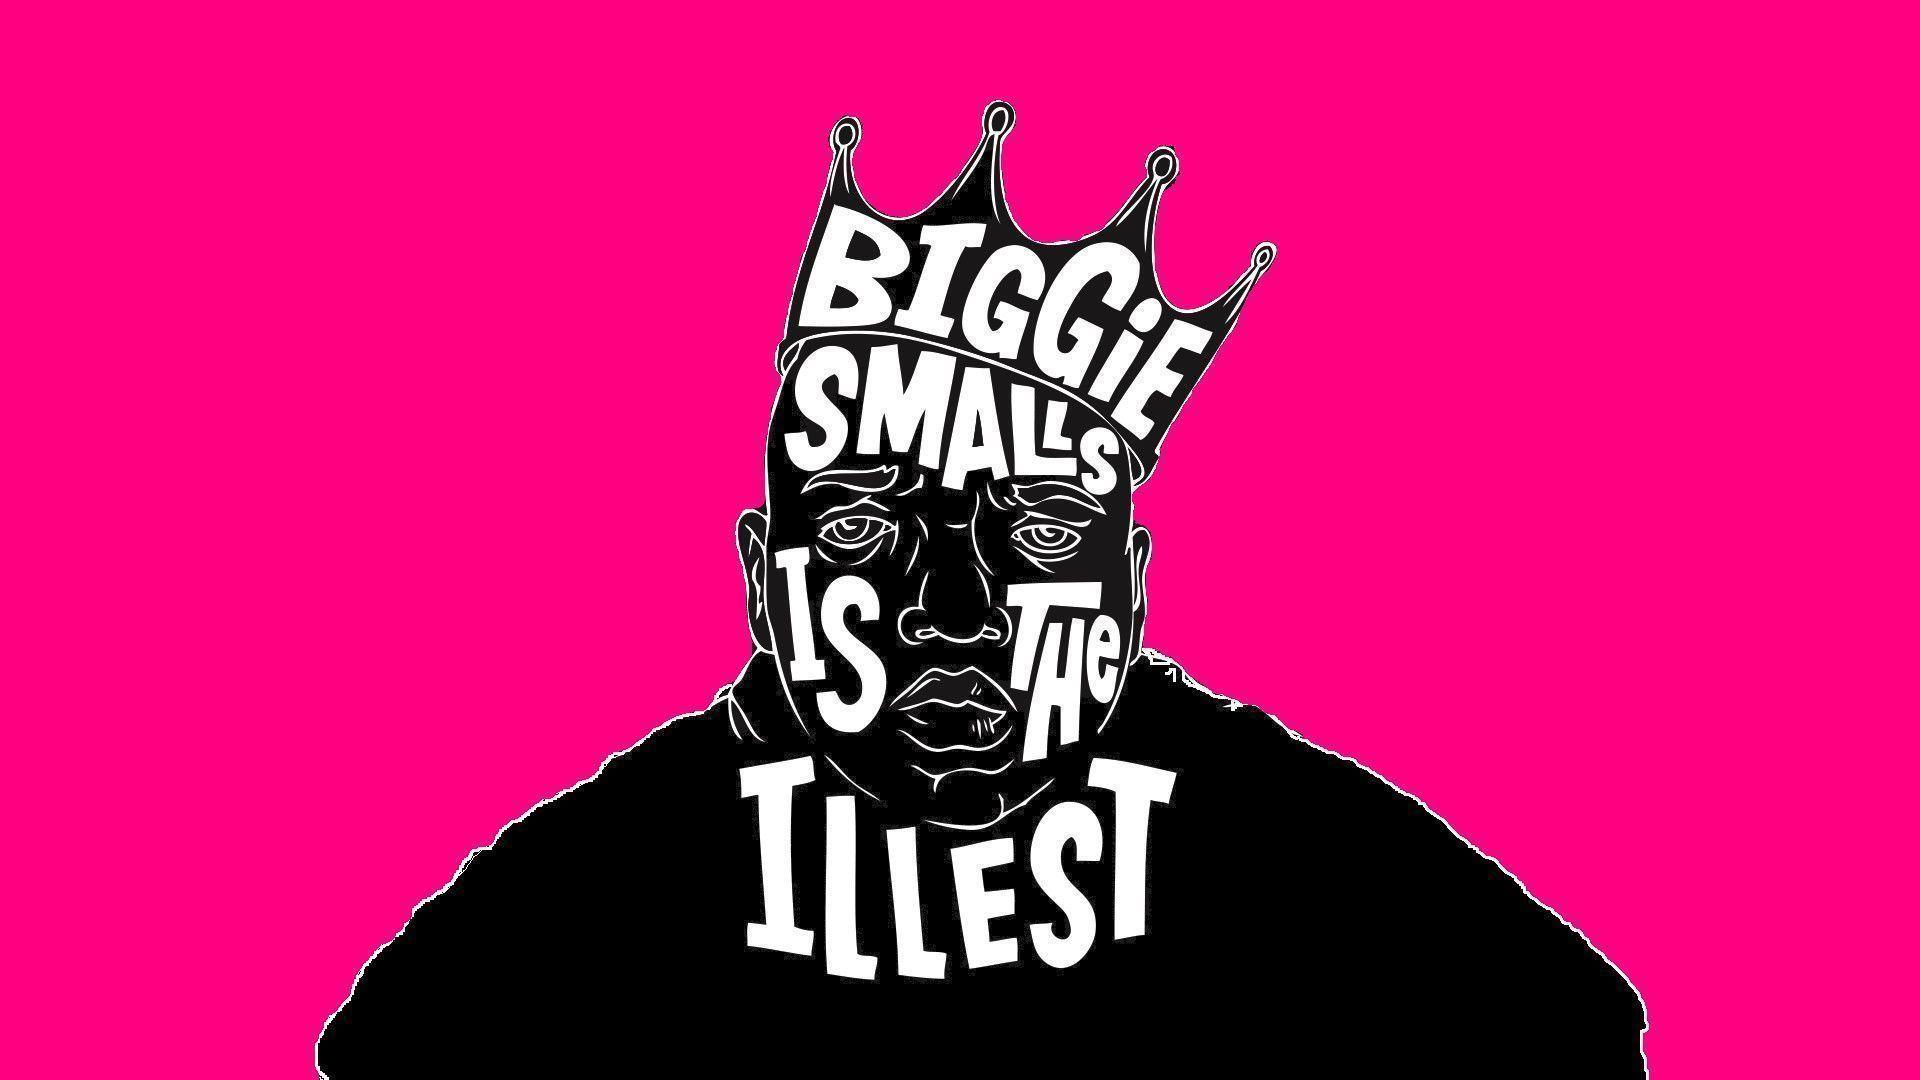 35 Best Free Biggie Smalls Wallpapers Wallpaperaccess